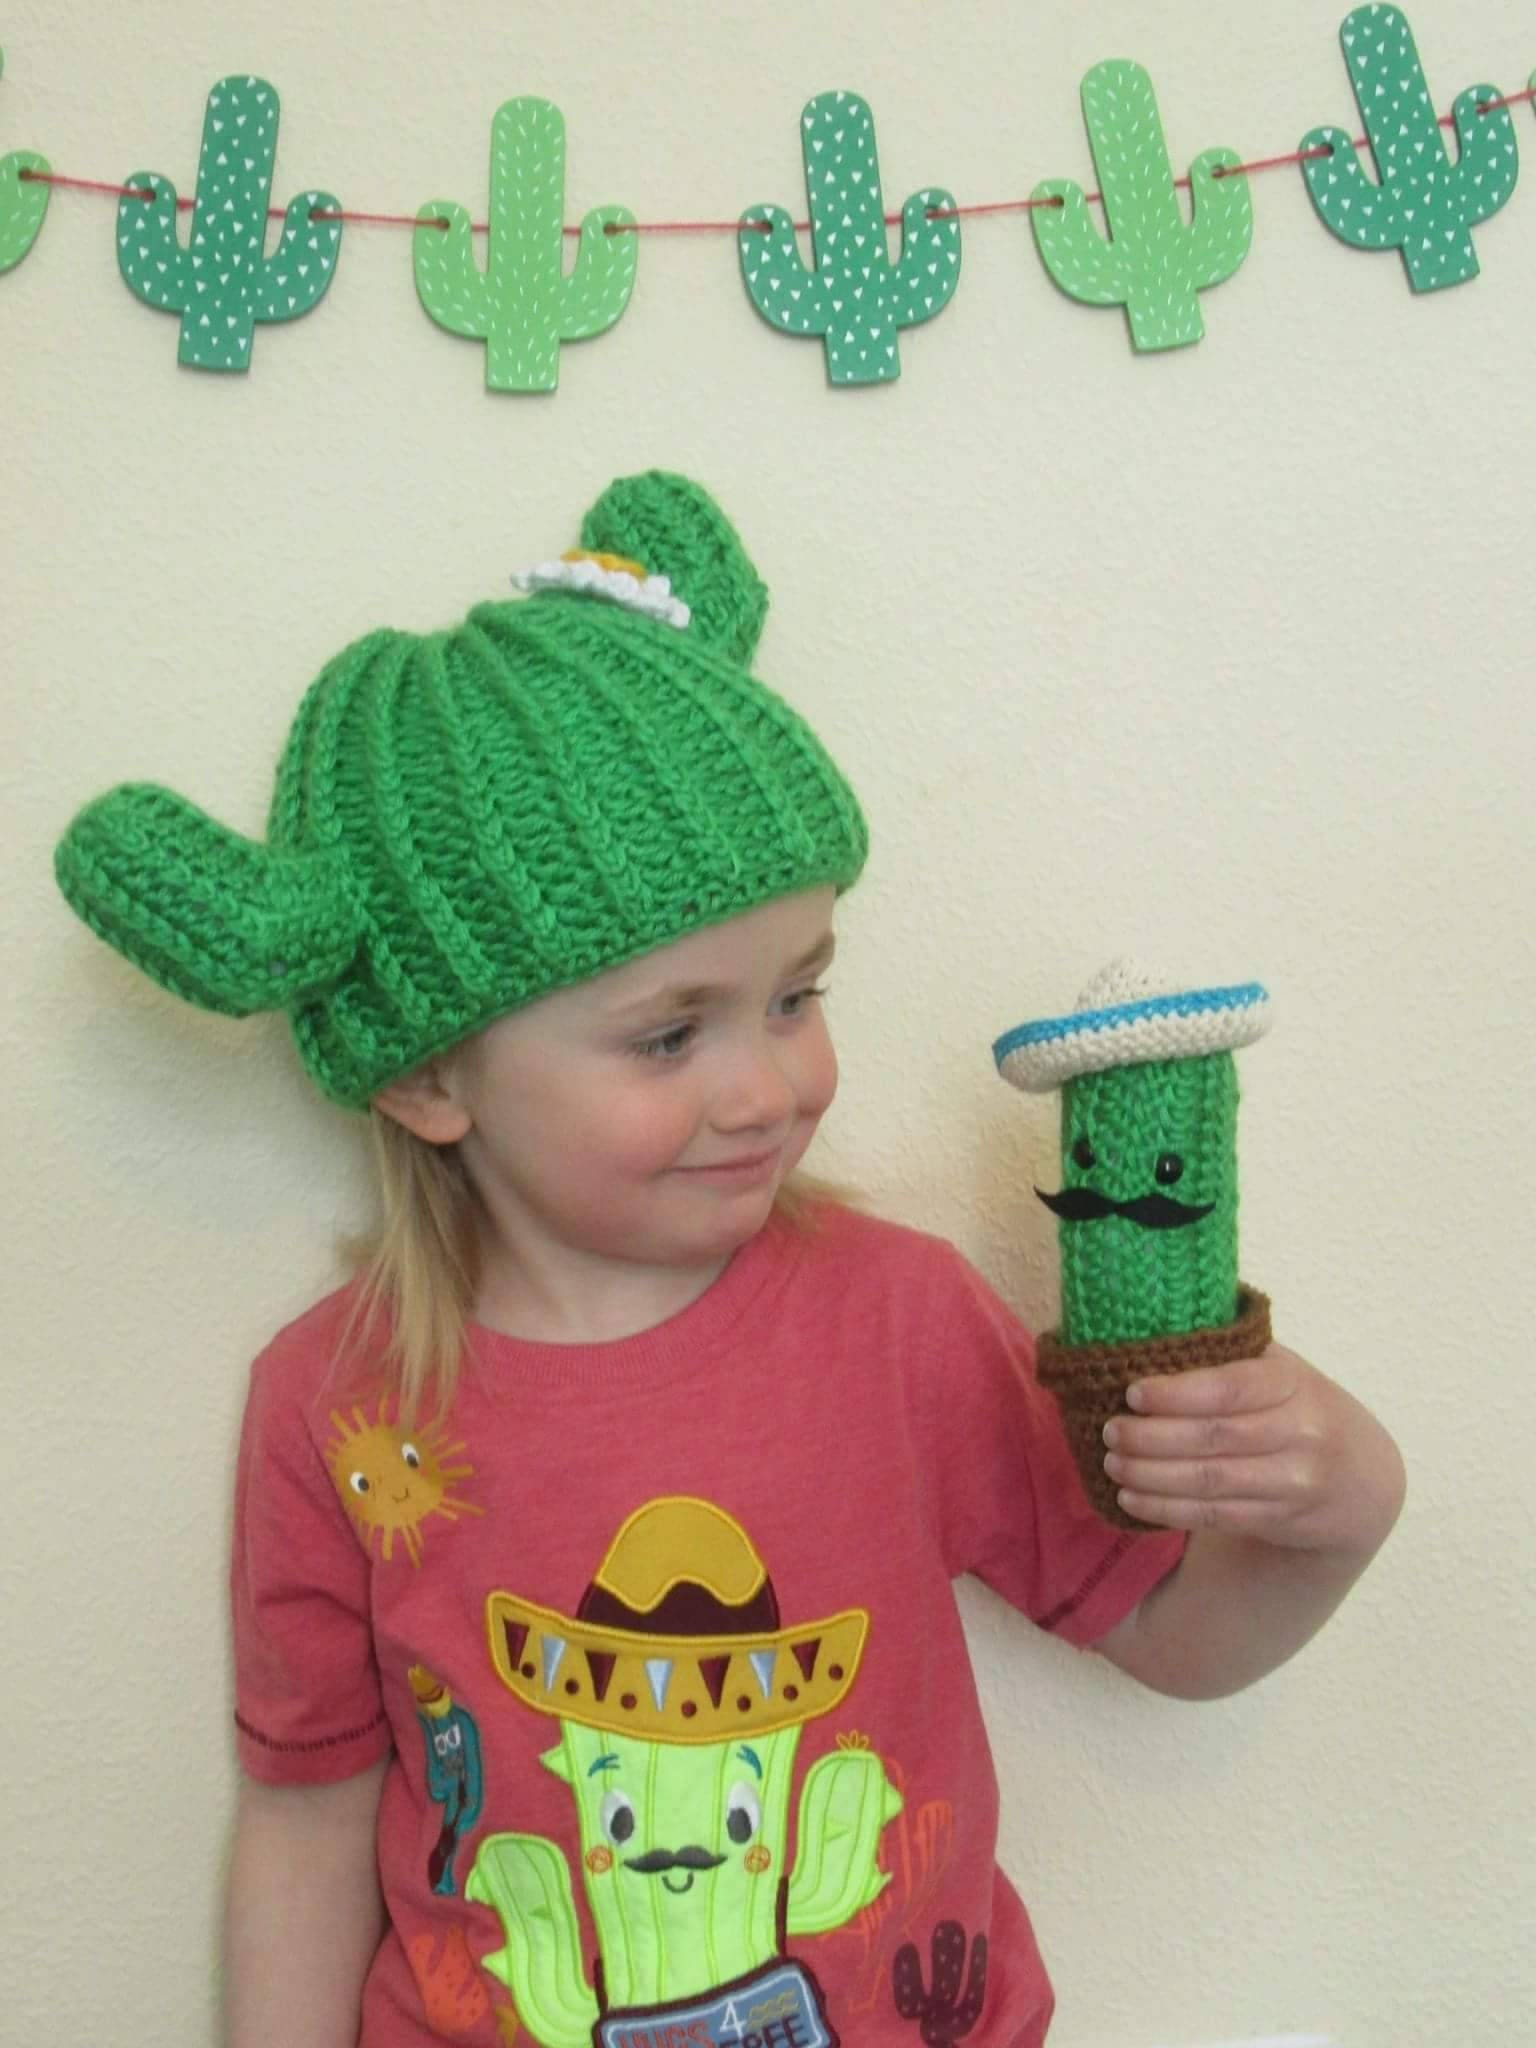 Crochet The Wild West With Cactus Amigurumi Patterns - All Crochet ... | 2048x1536